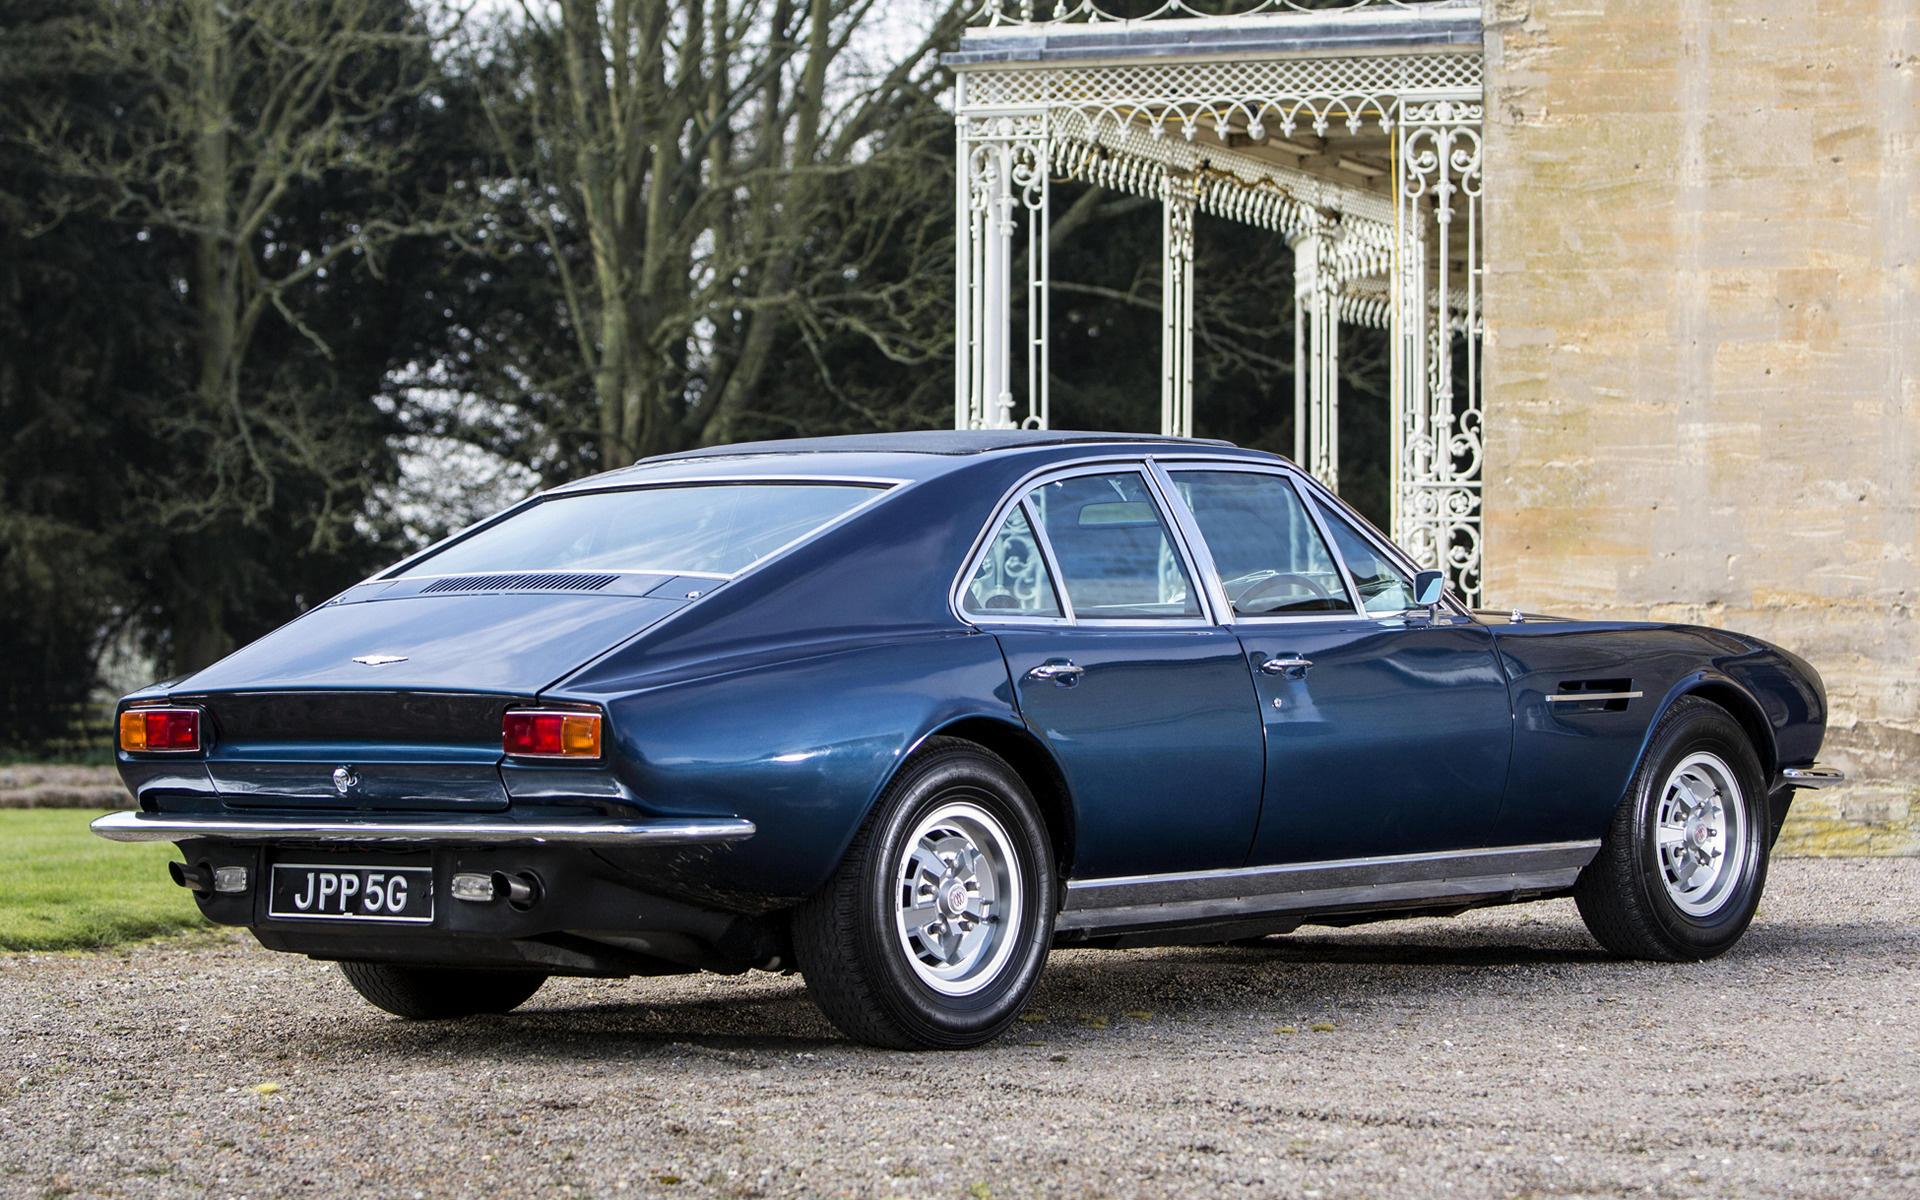 1969 Aston Martin Lagonda Prototype Wallpapers And Hd Images Car Pixel